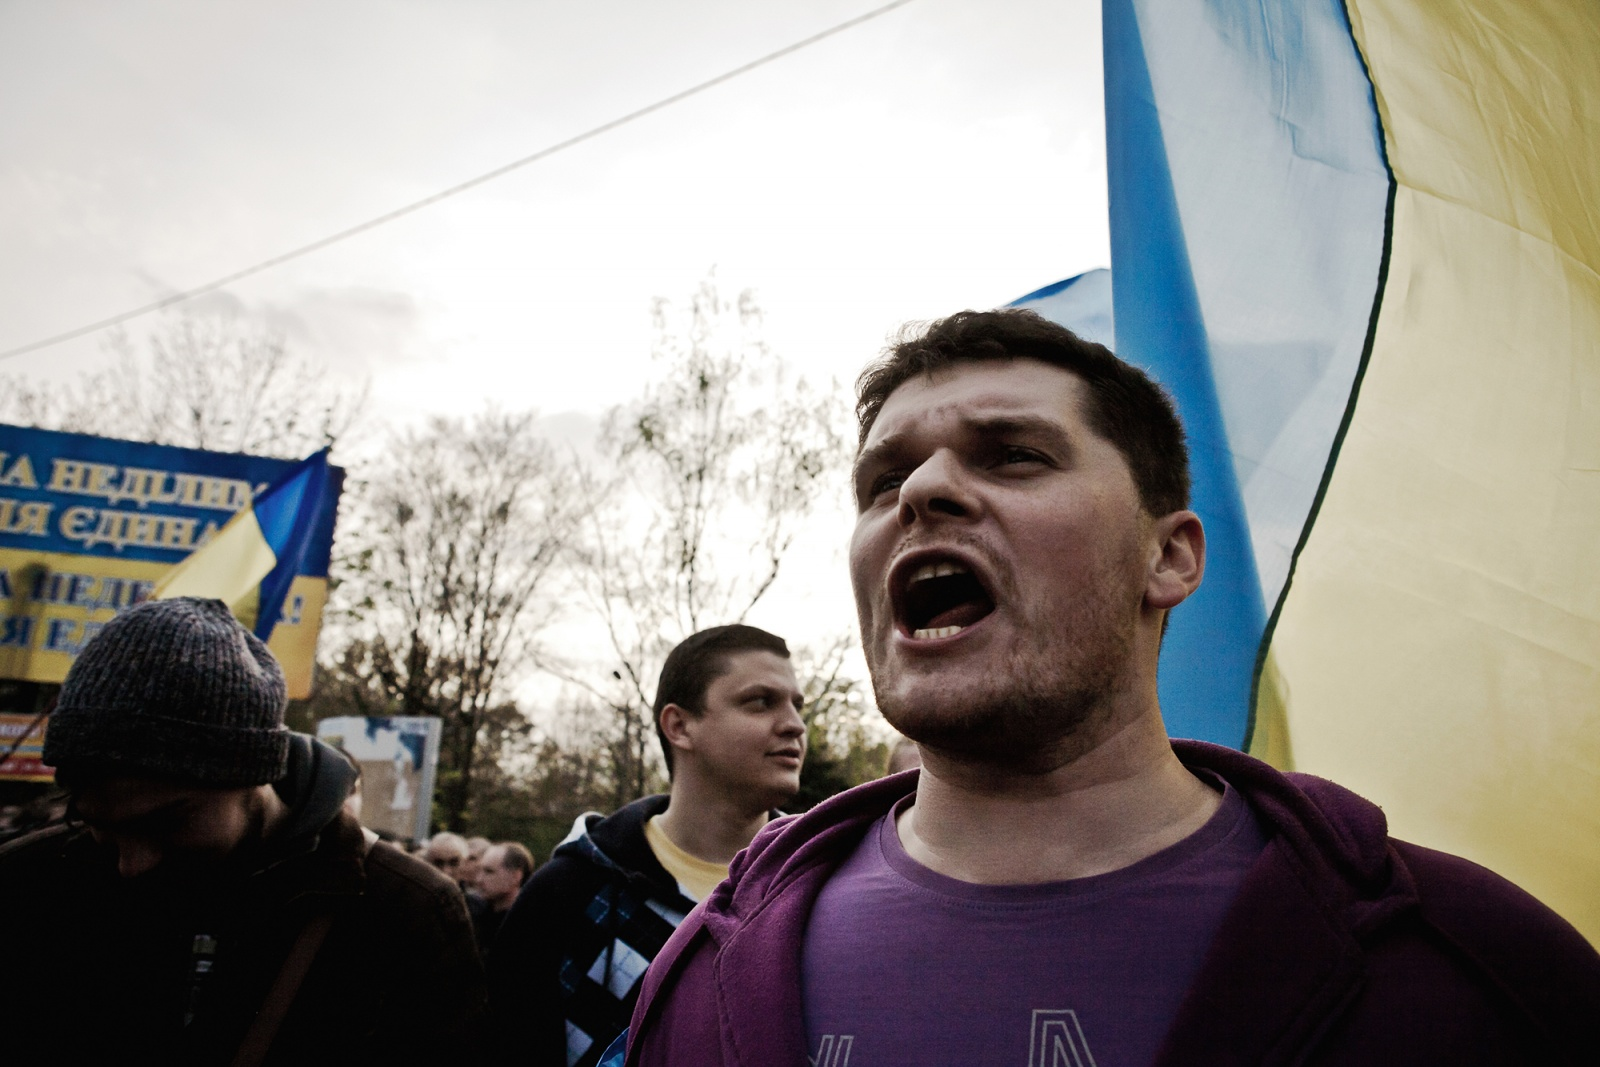 Kramatorsk, Donetsk Oblast, Ukraine